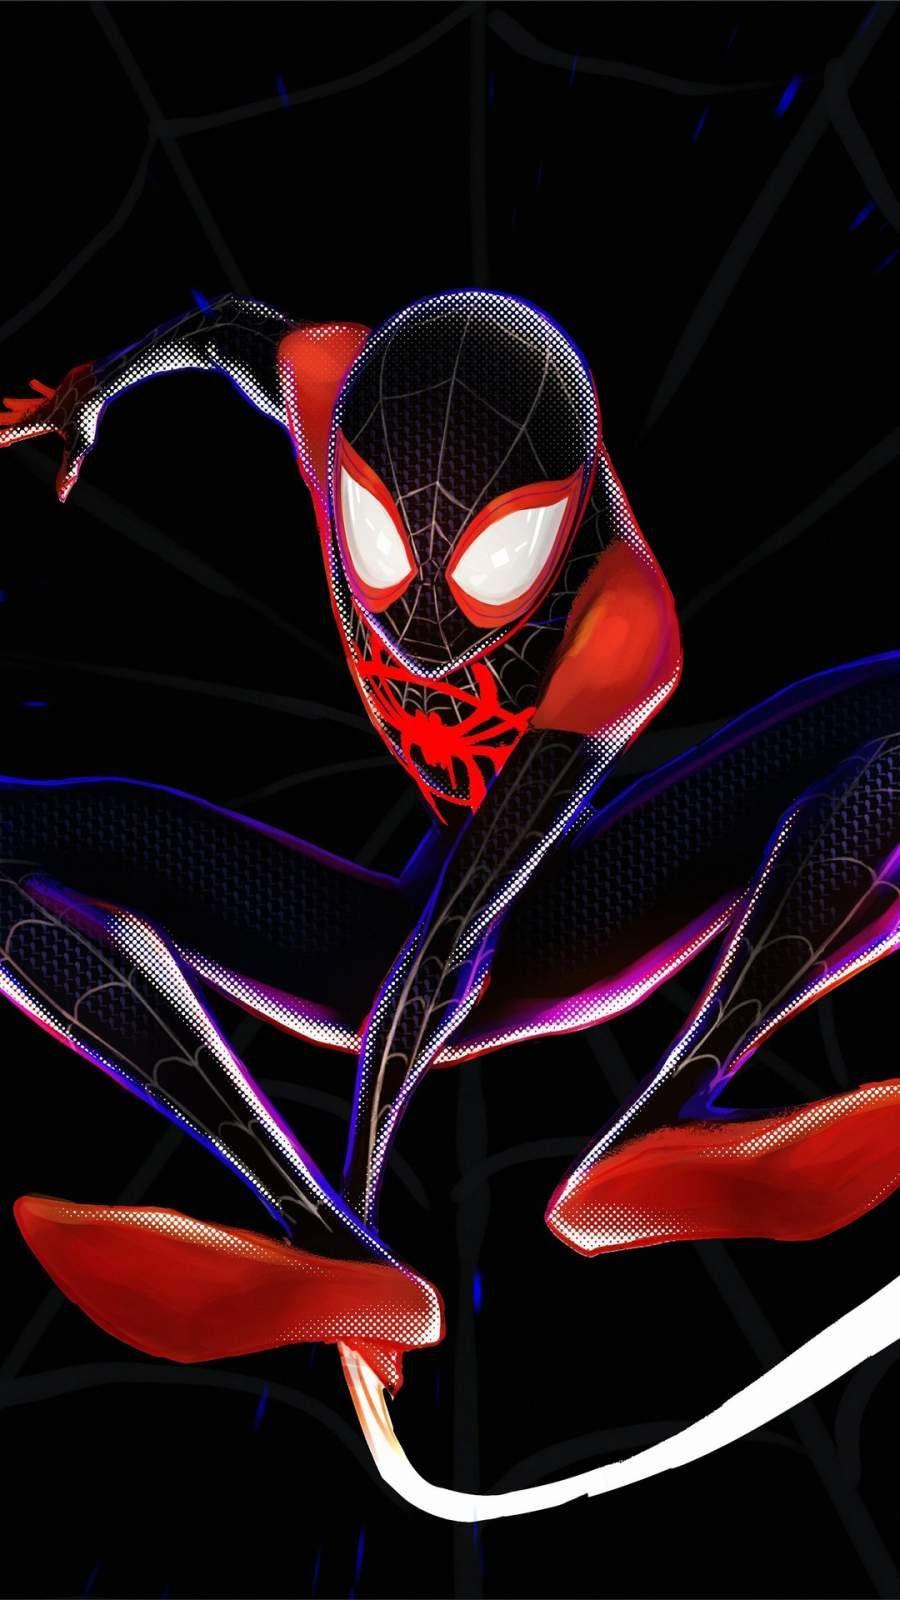 Spiderman 4k Miles Morales Iphone Wallpaper In 2020 Spiderman Spiderman Artwork Superhero Wallpaper